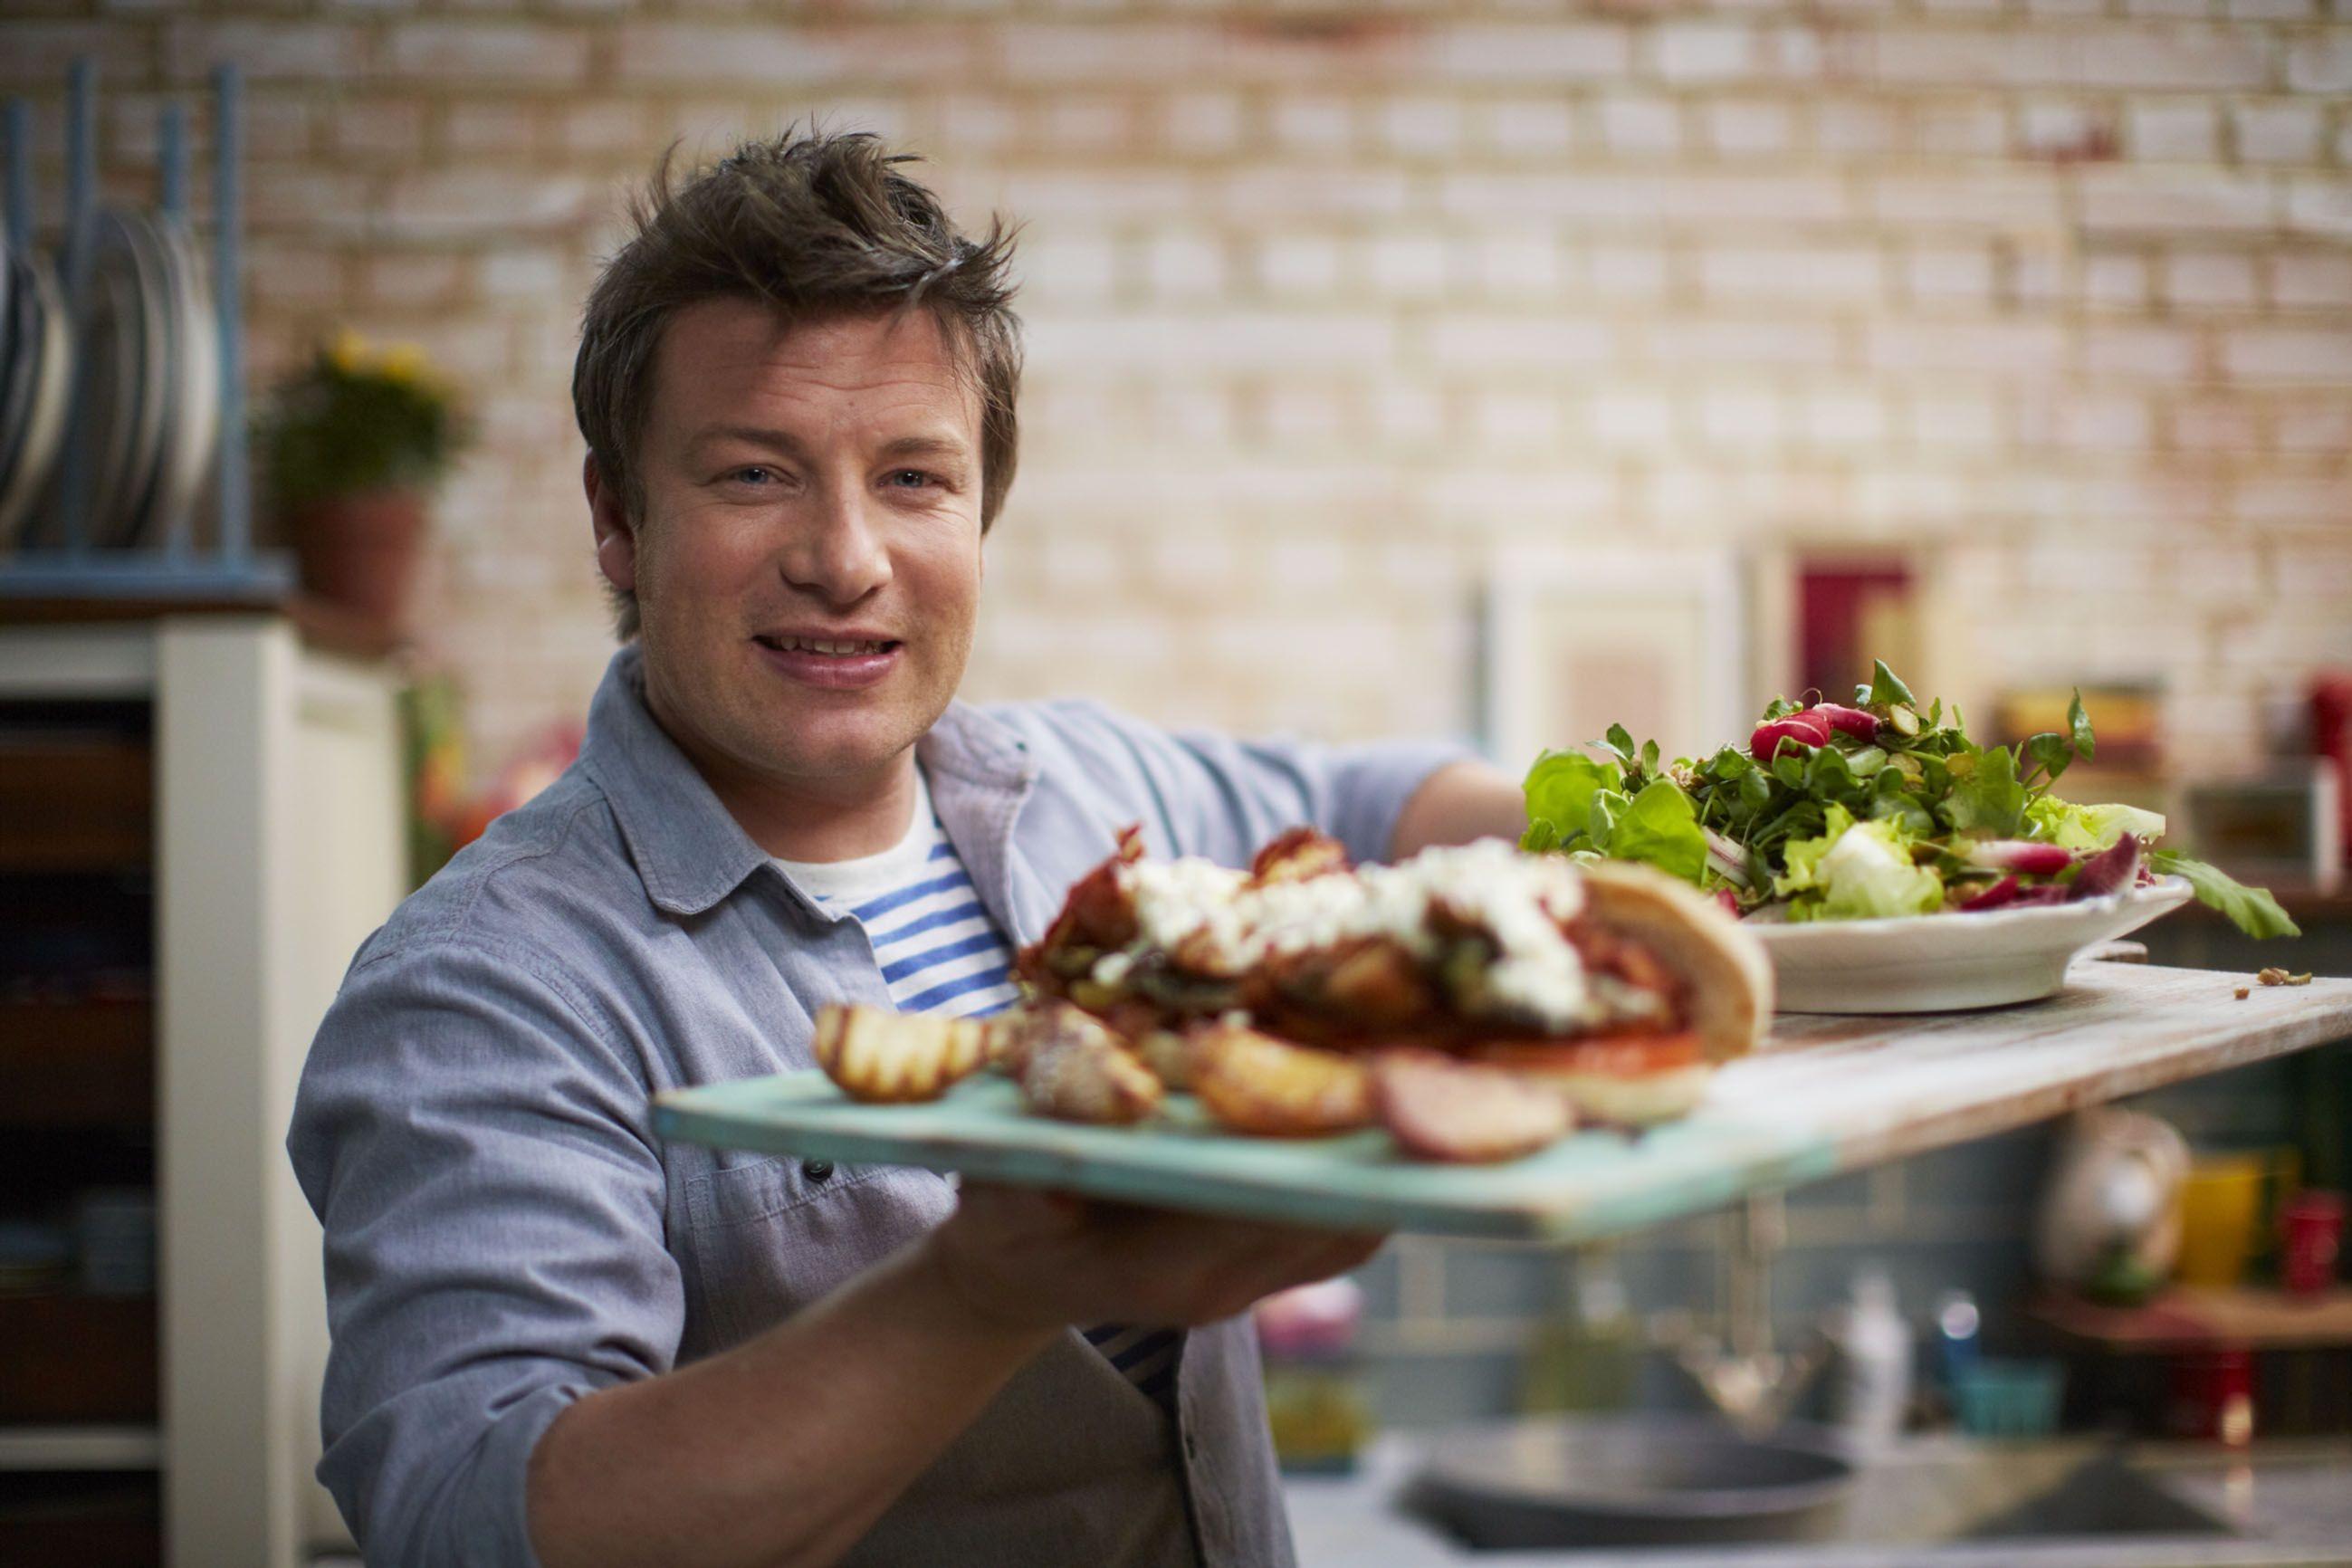 Jamies 15 Minuten Küche - Krebsbolognese / Jumboburger